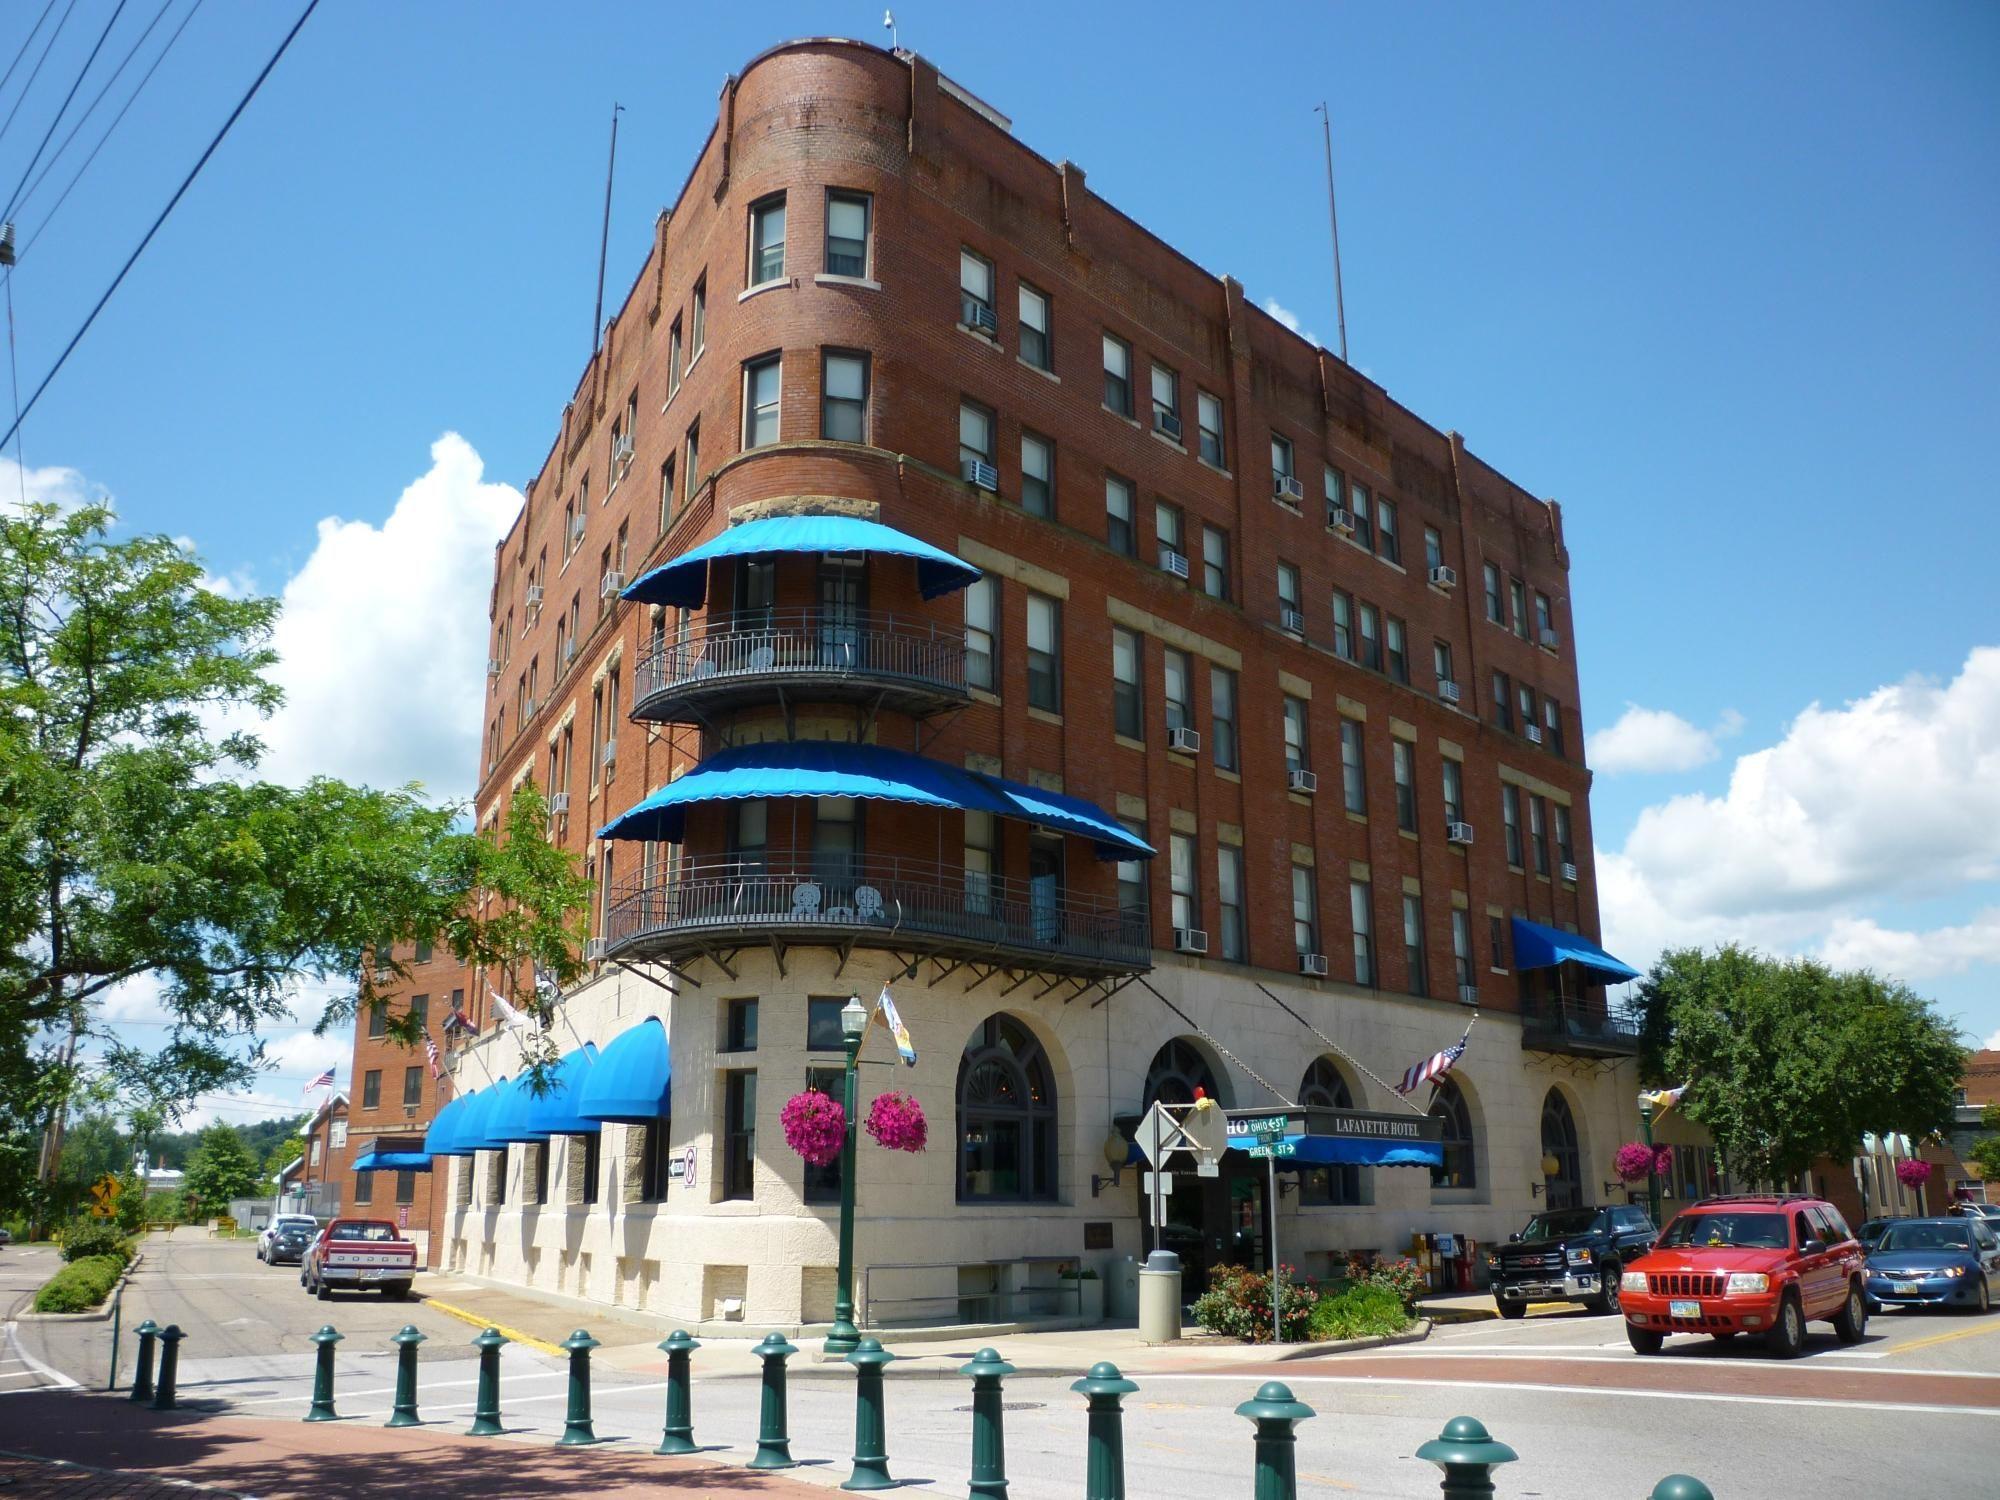 Lafayette Hotel Marietta Ohio Voices And Footsteps Have Been Heard In Empty Hallways